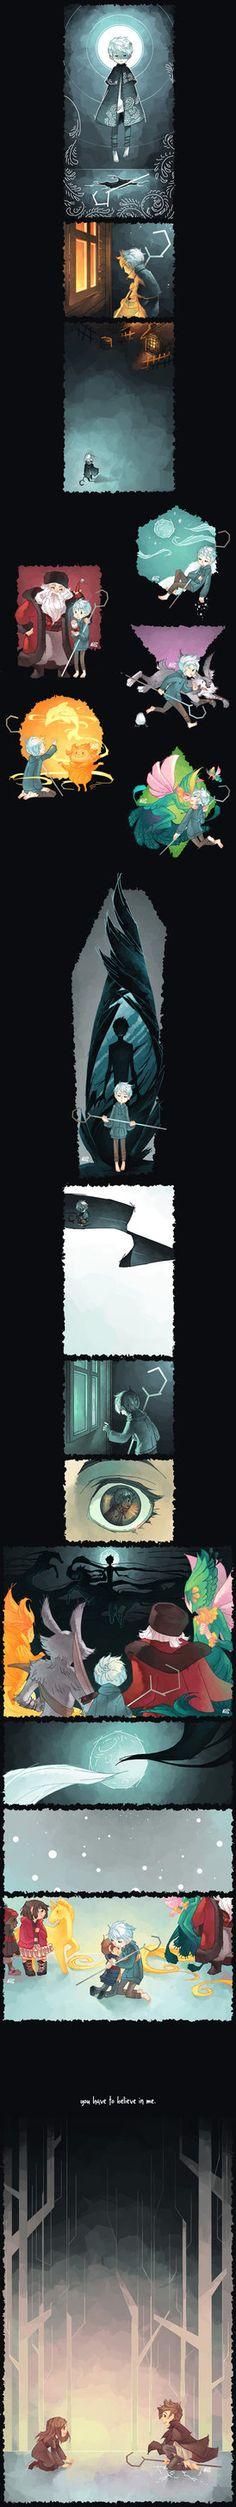 deviantART: More Like Jack Frost by ~ramida-r